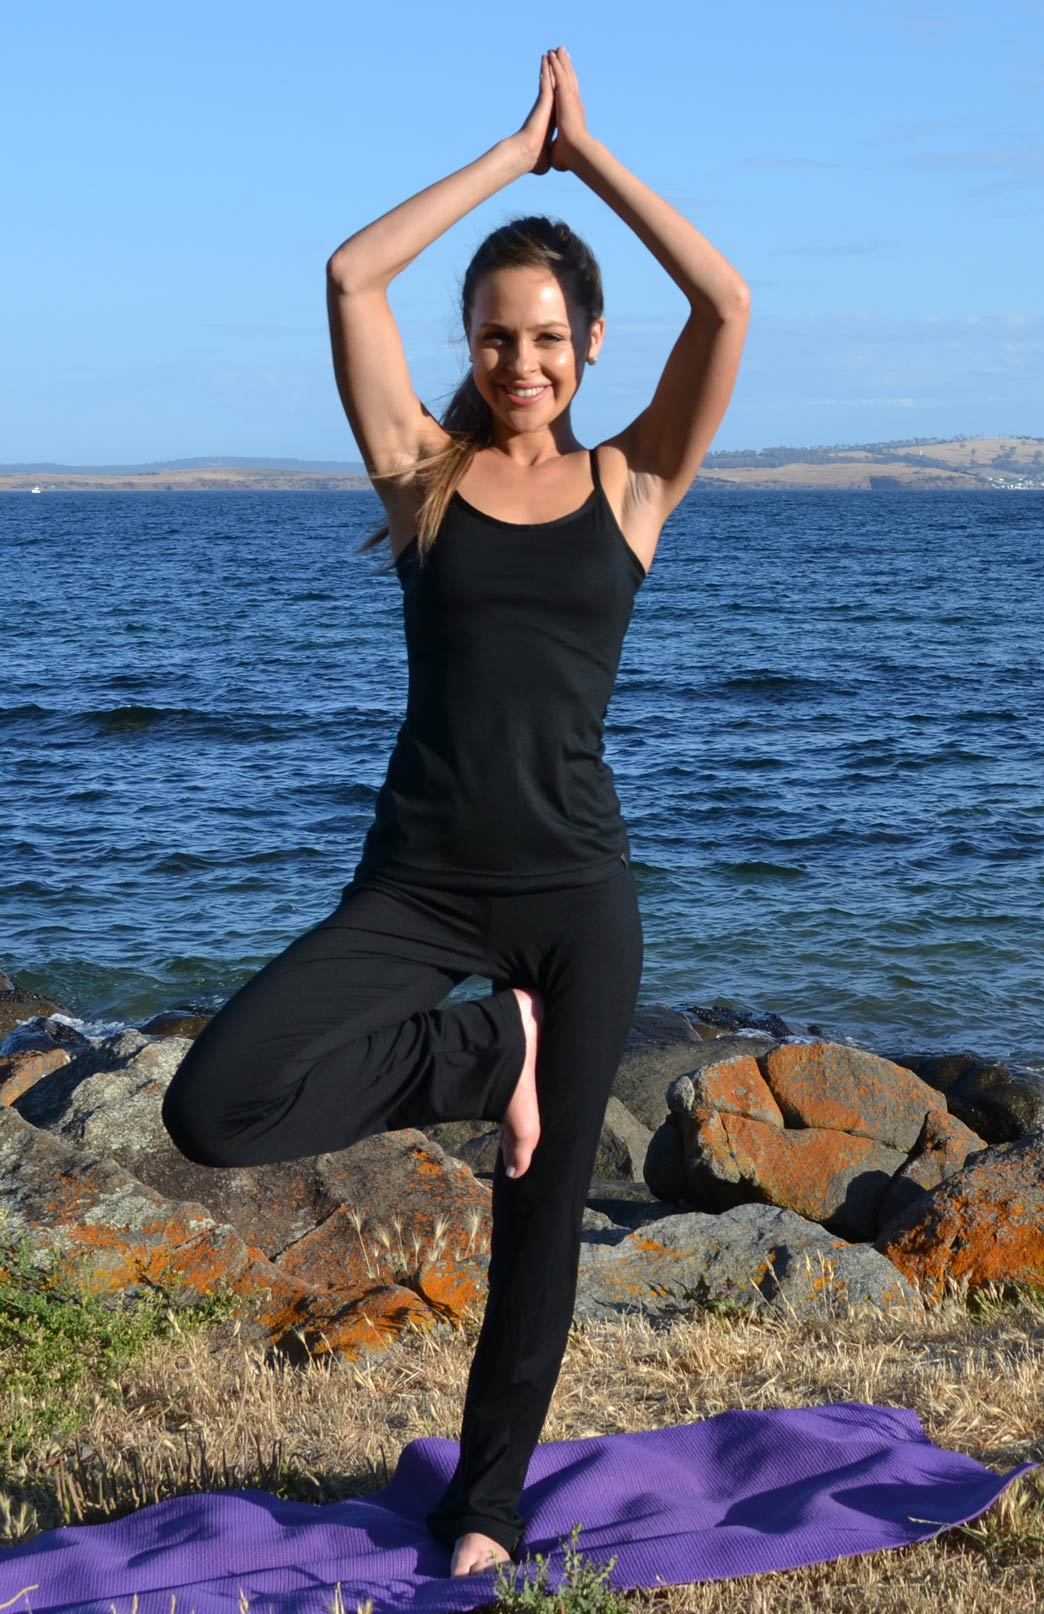 Camisole Top - Women's Wool Black Camisole Layering Thermal Tank Top - Smitten Merino Tasmania Australia